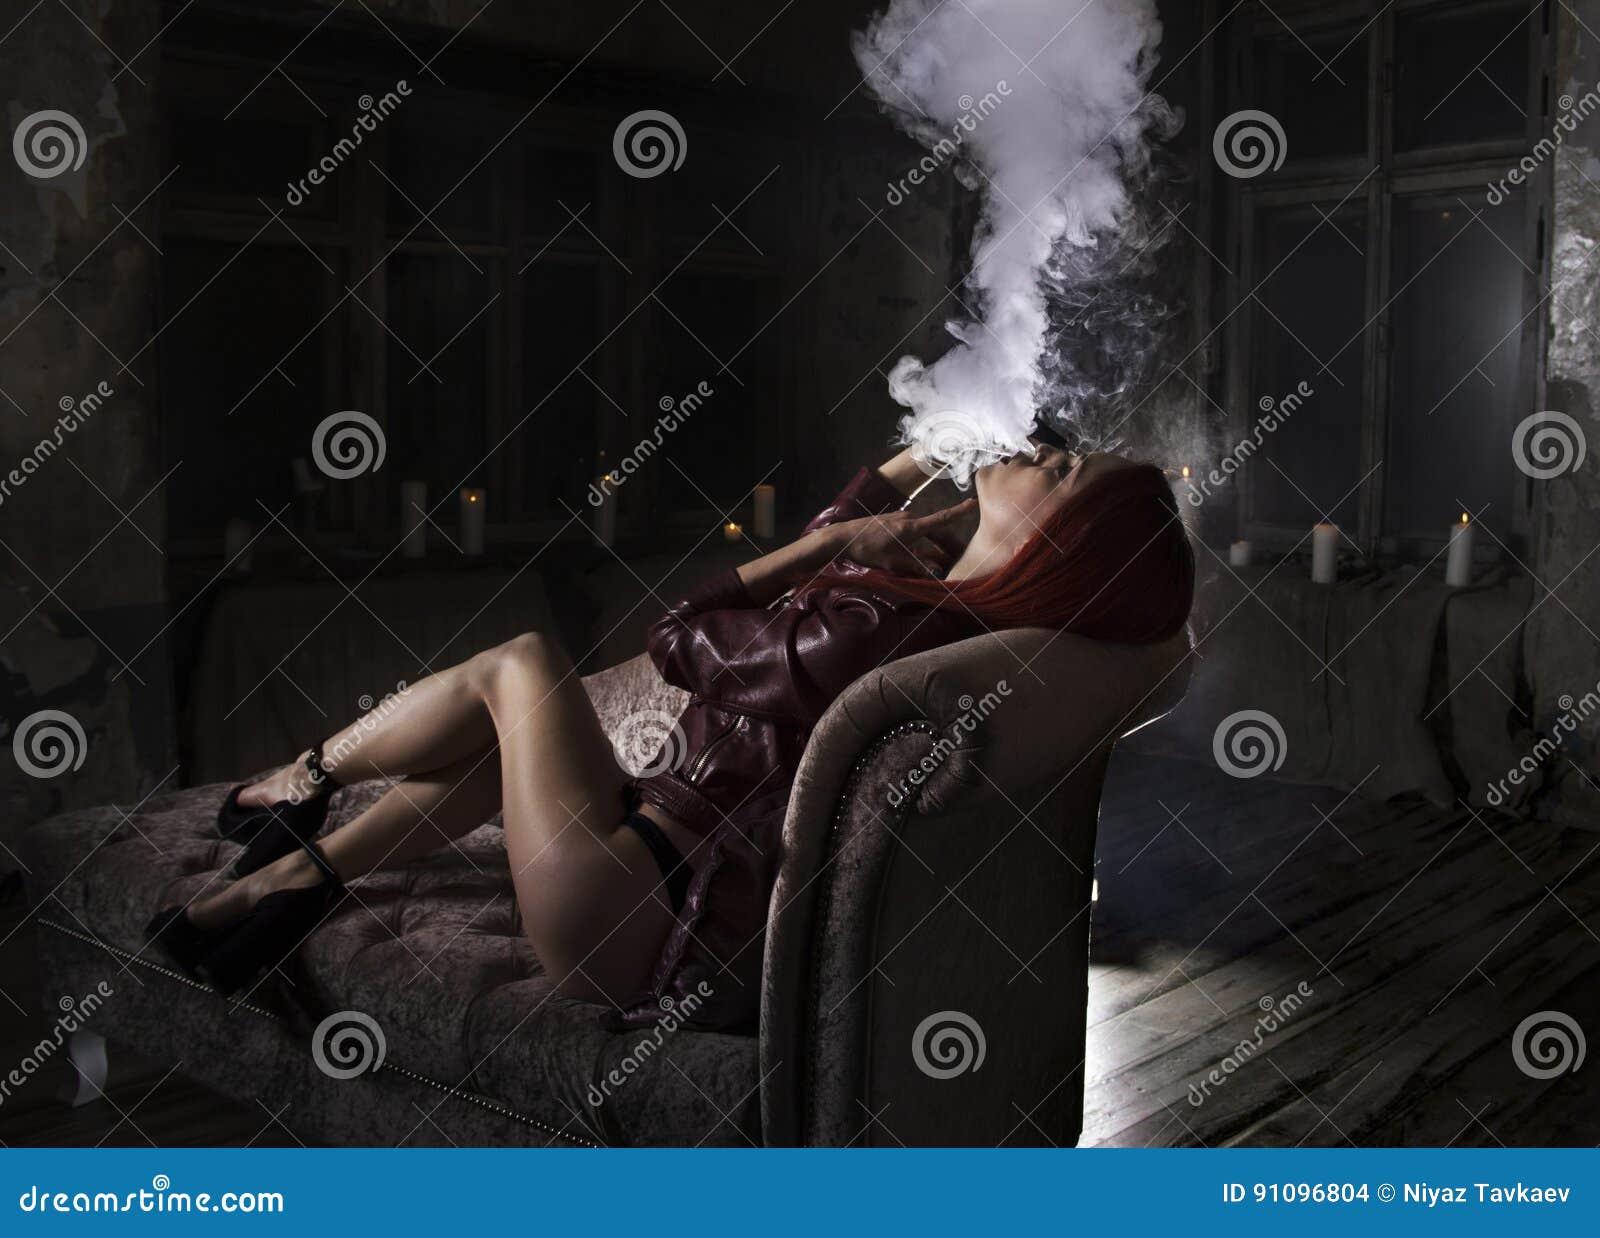 Курит сигарету и ласкает — 15